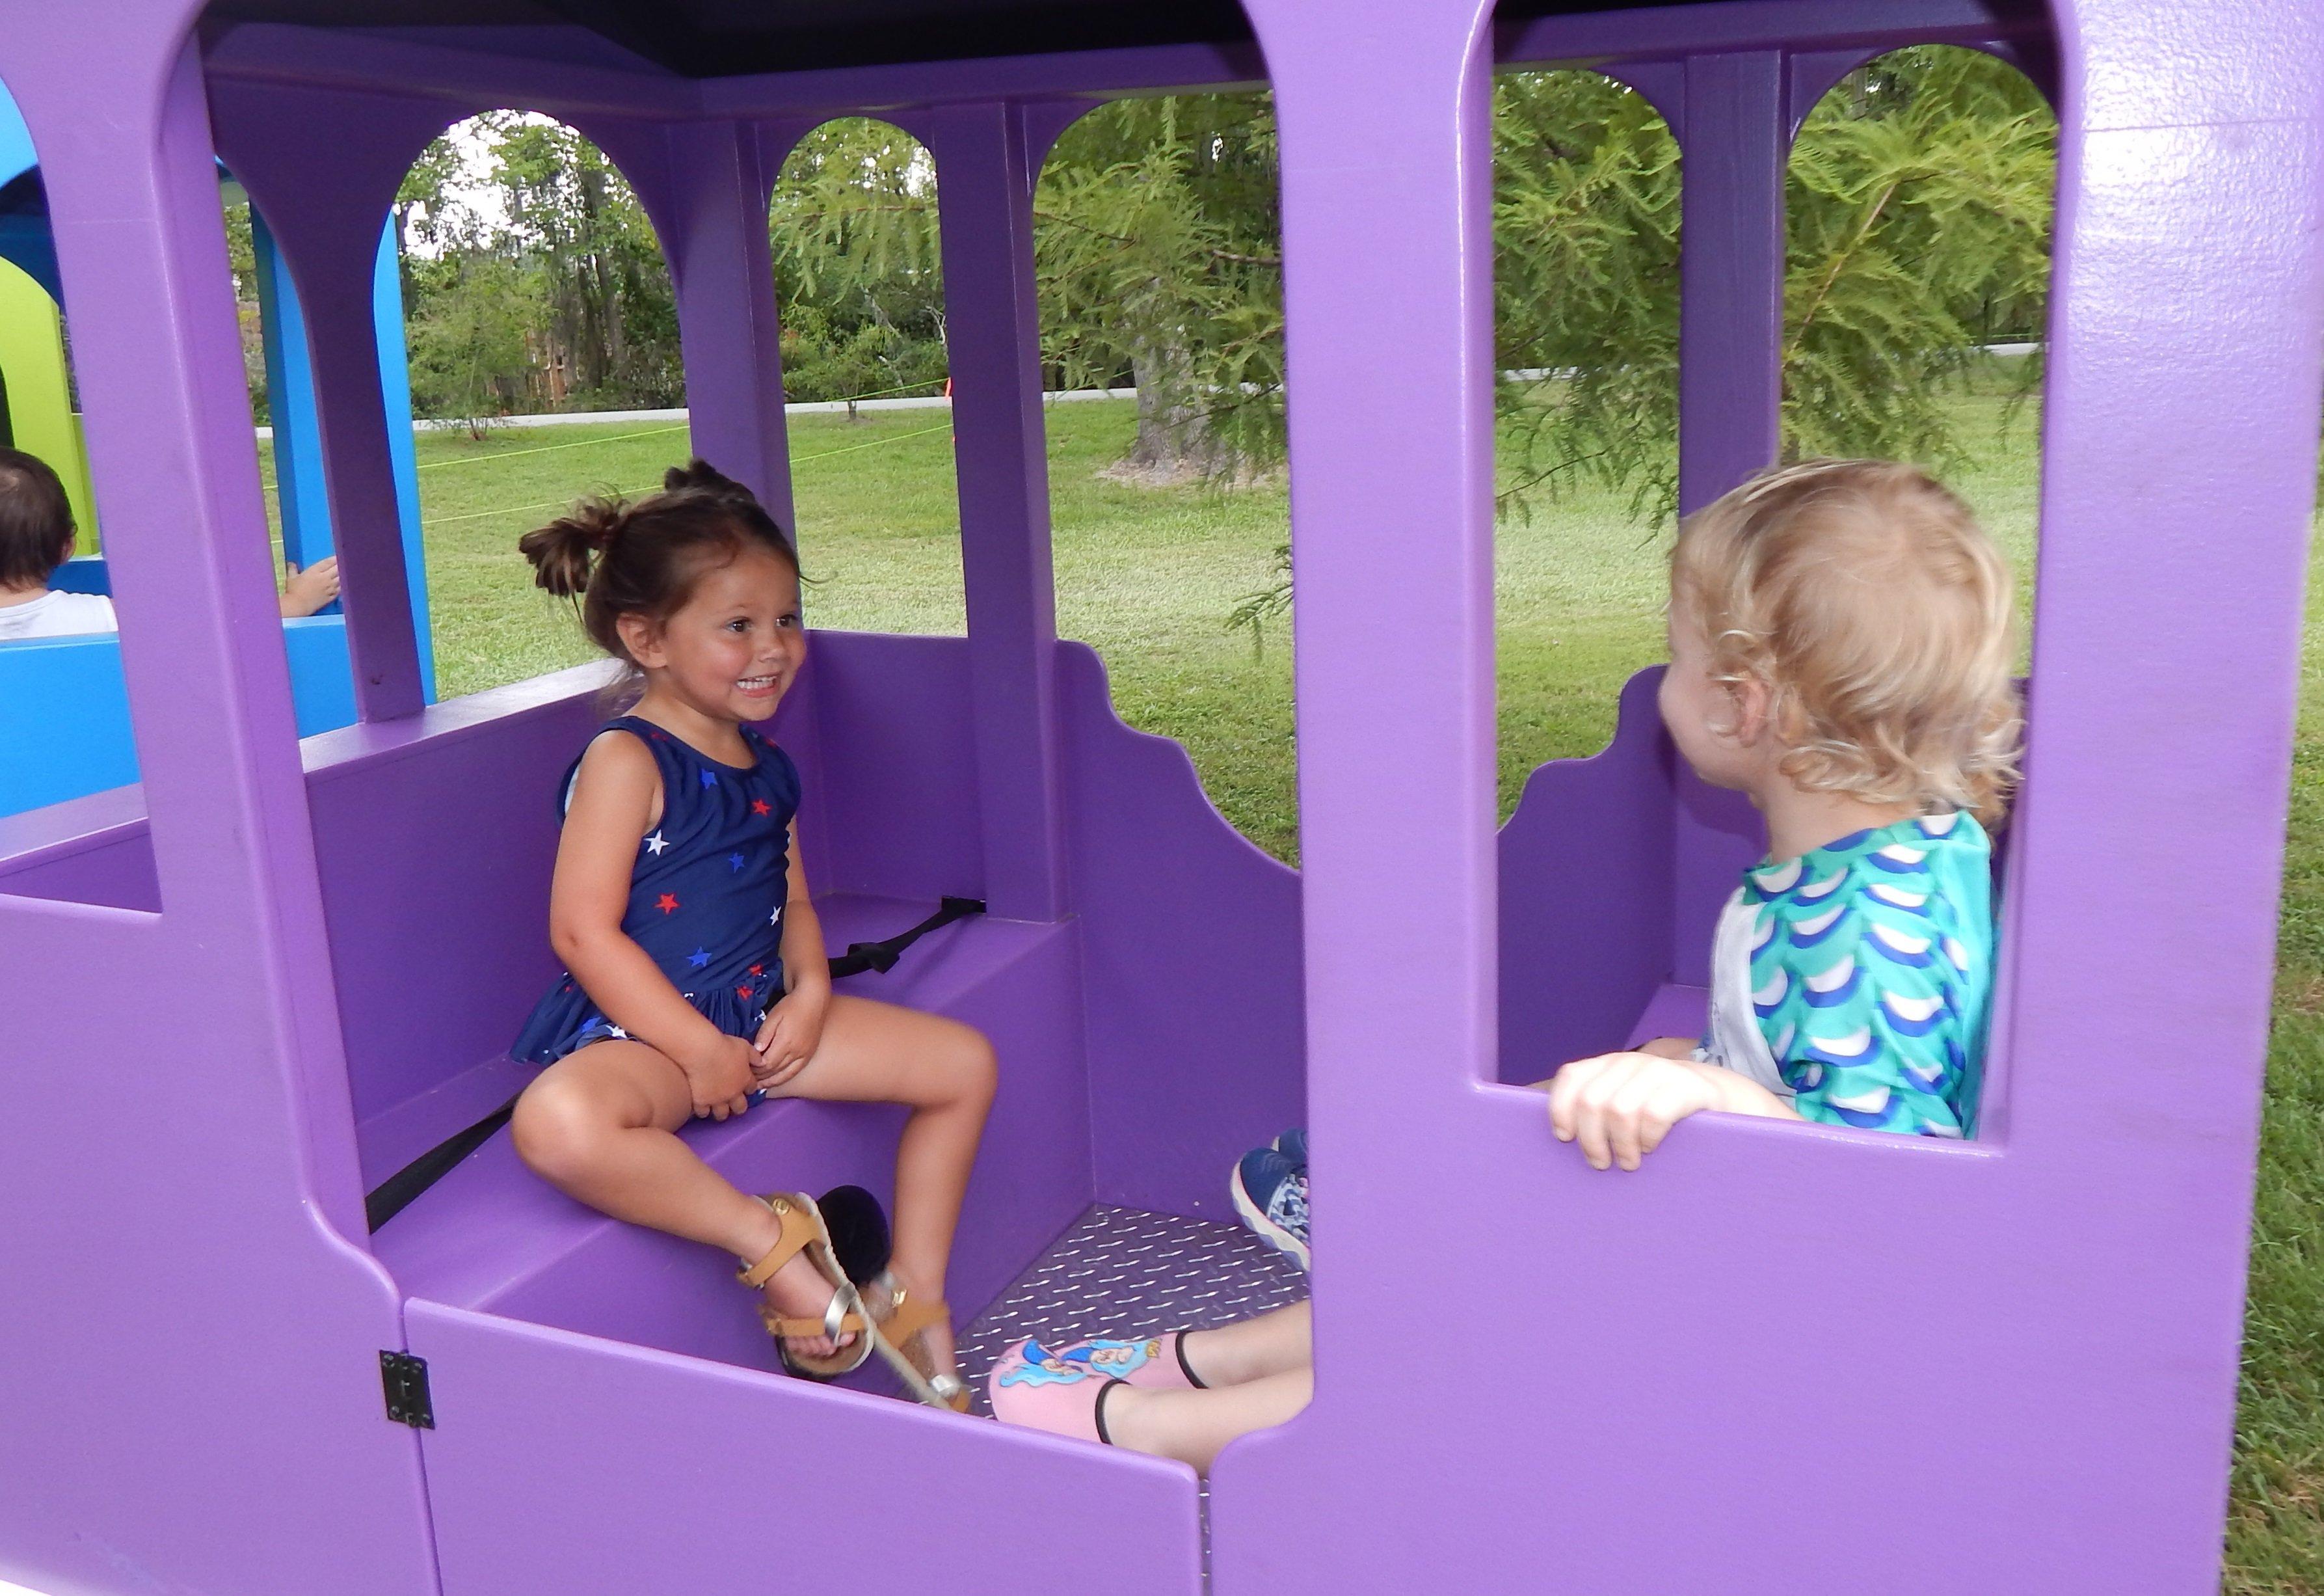 Kids and adults alike enjoyed the train rides. Photo by Mark Swendra